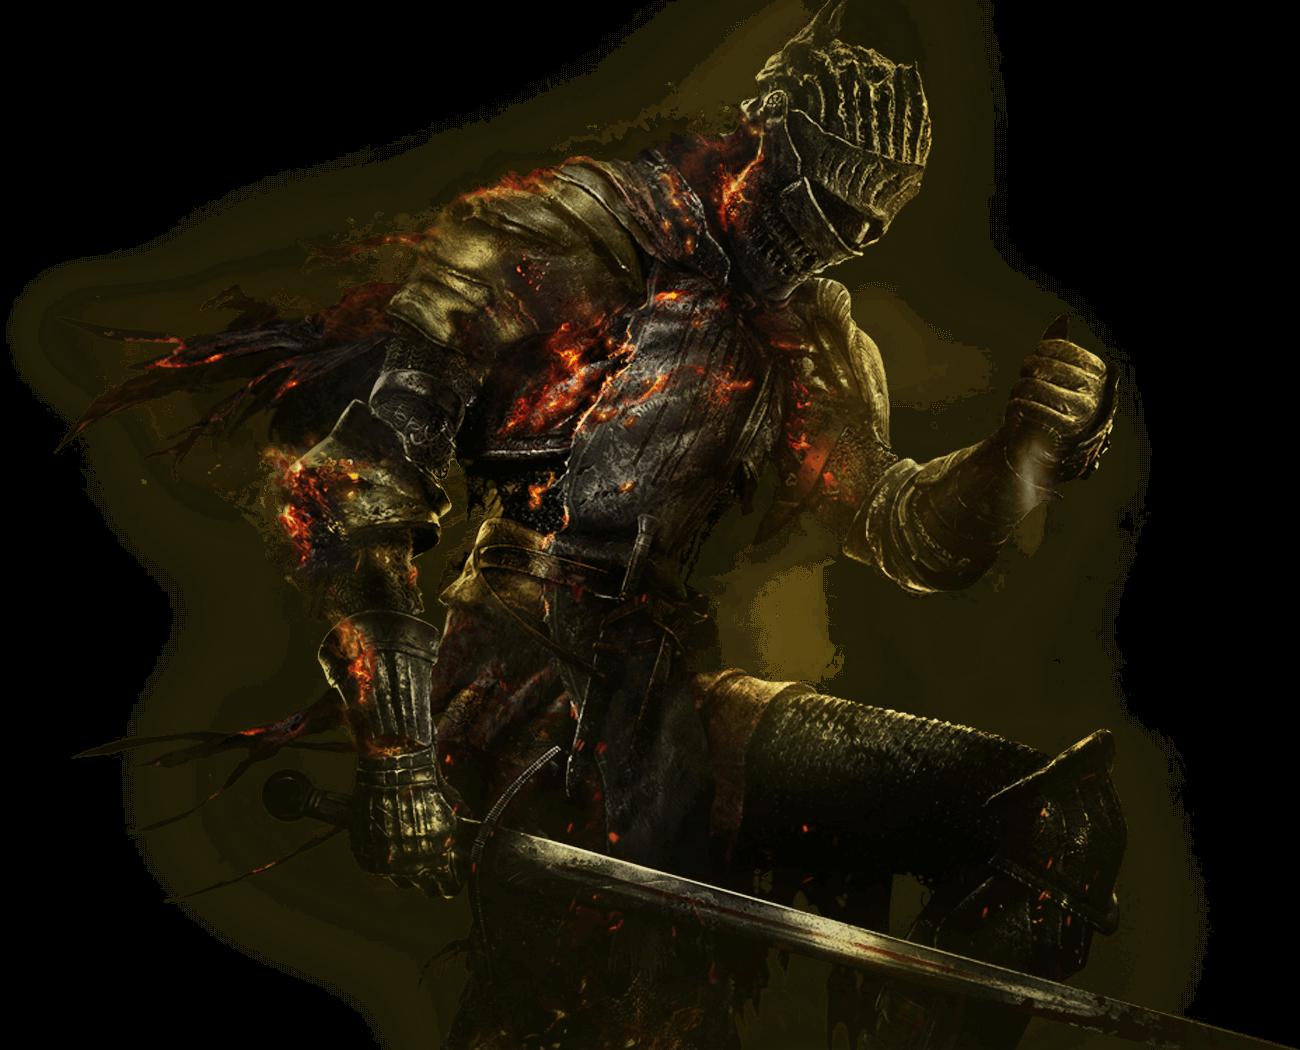 Download Dark Souls Picture HQ PNG Image | FreePNGImg